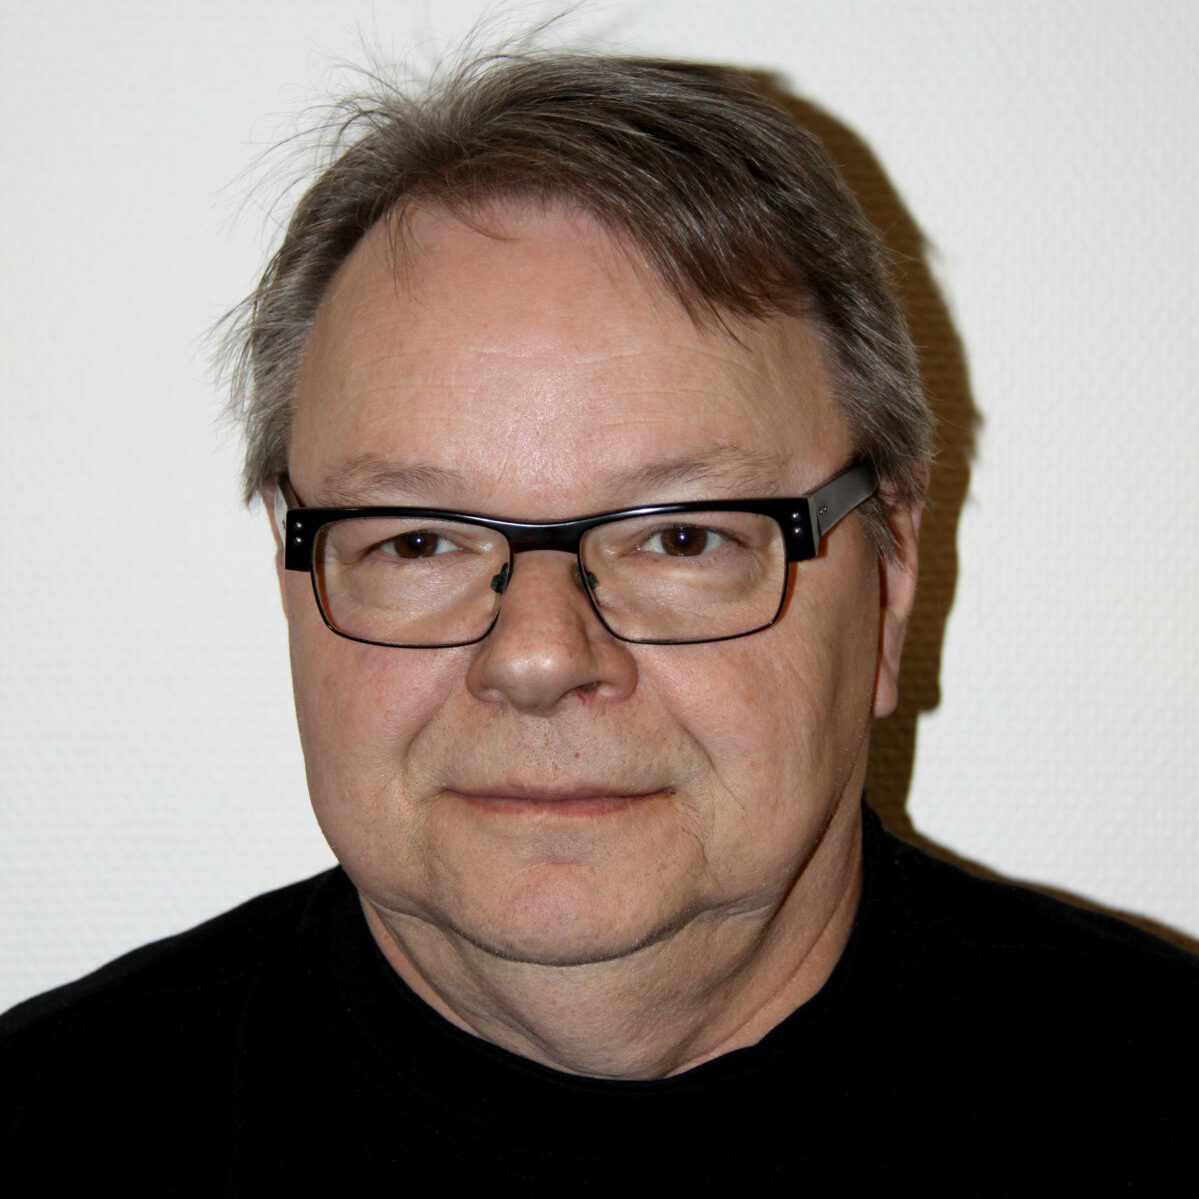 Donald Påhlsson